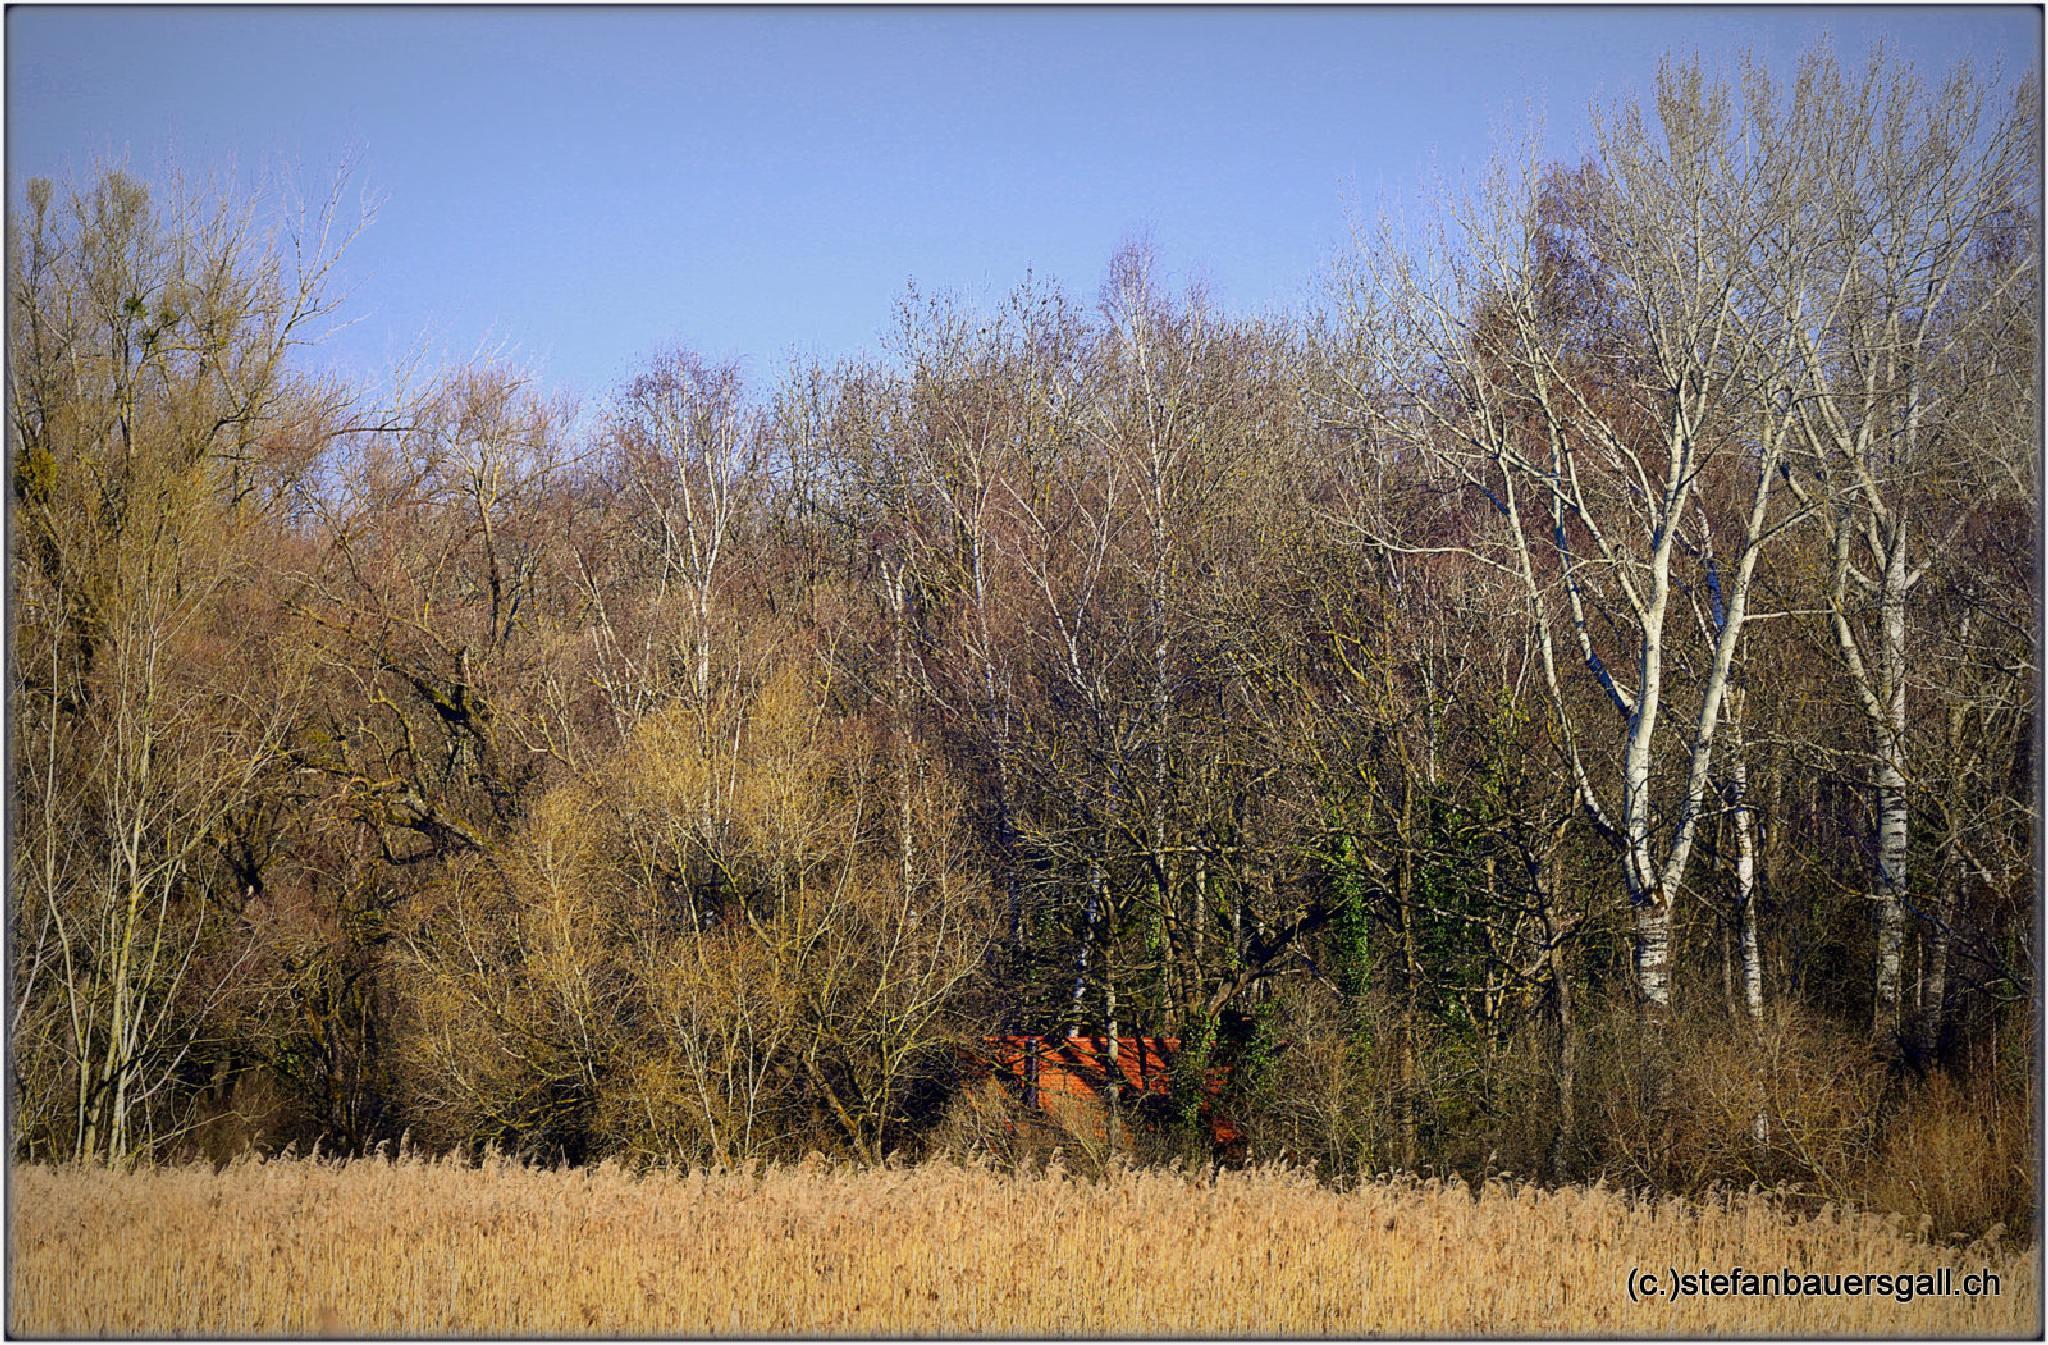 """house in the wilderness."" by BauerStefan"